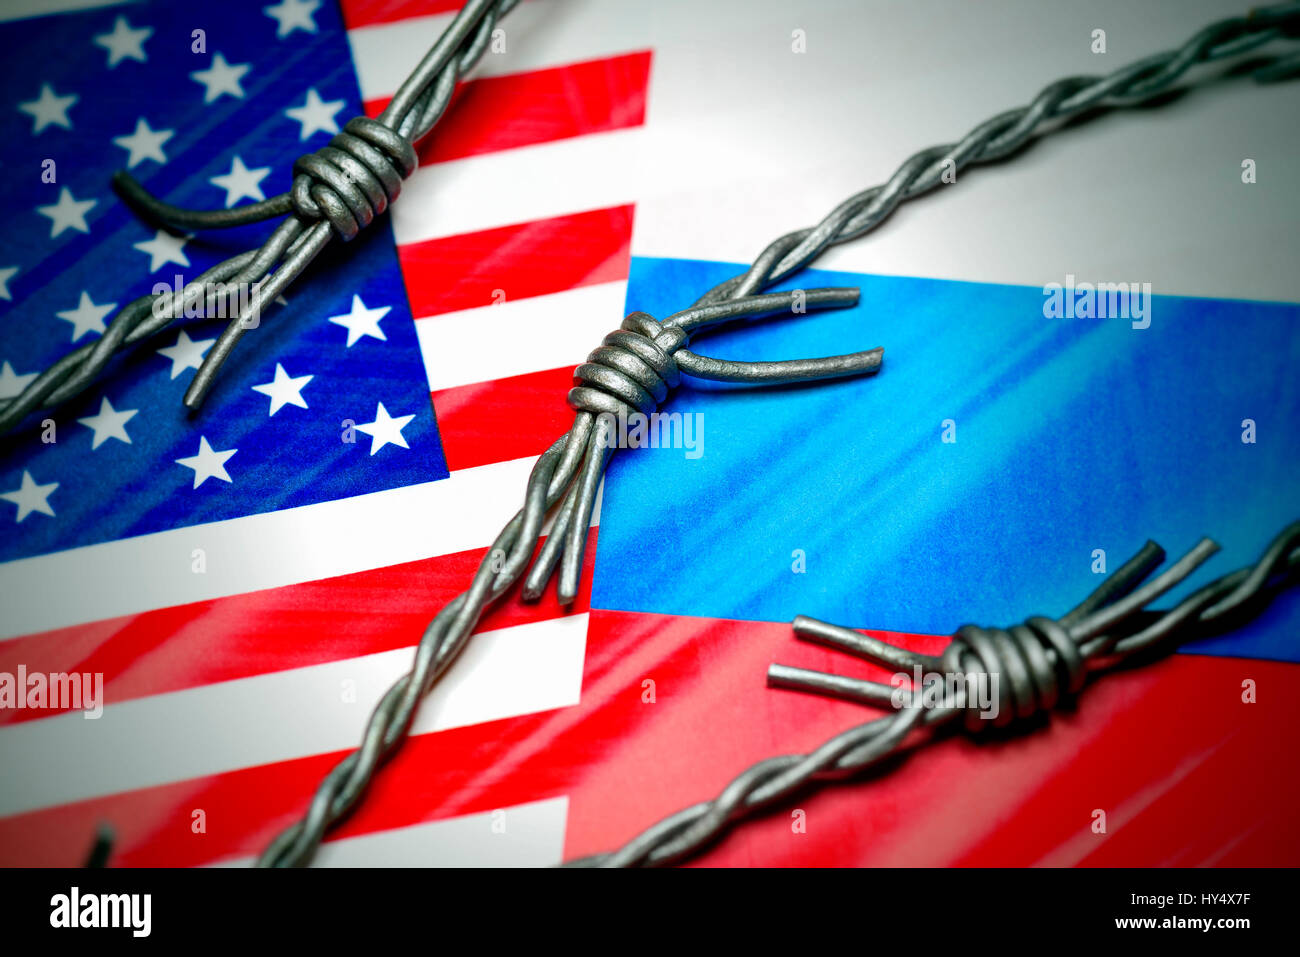 Flags of the USA and Russia with barbed wire, cold war, Fahnen von USA und Russland mit Stacheldraht, Kalter Krieg - Stock Image